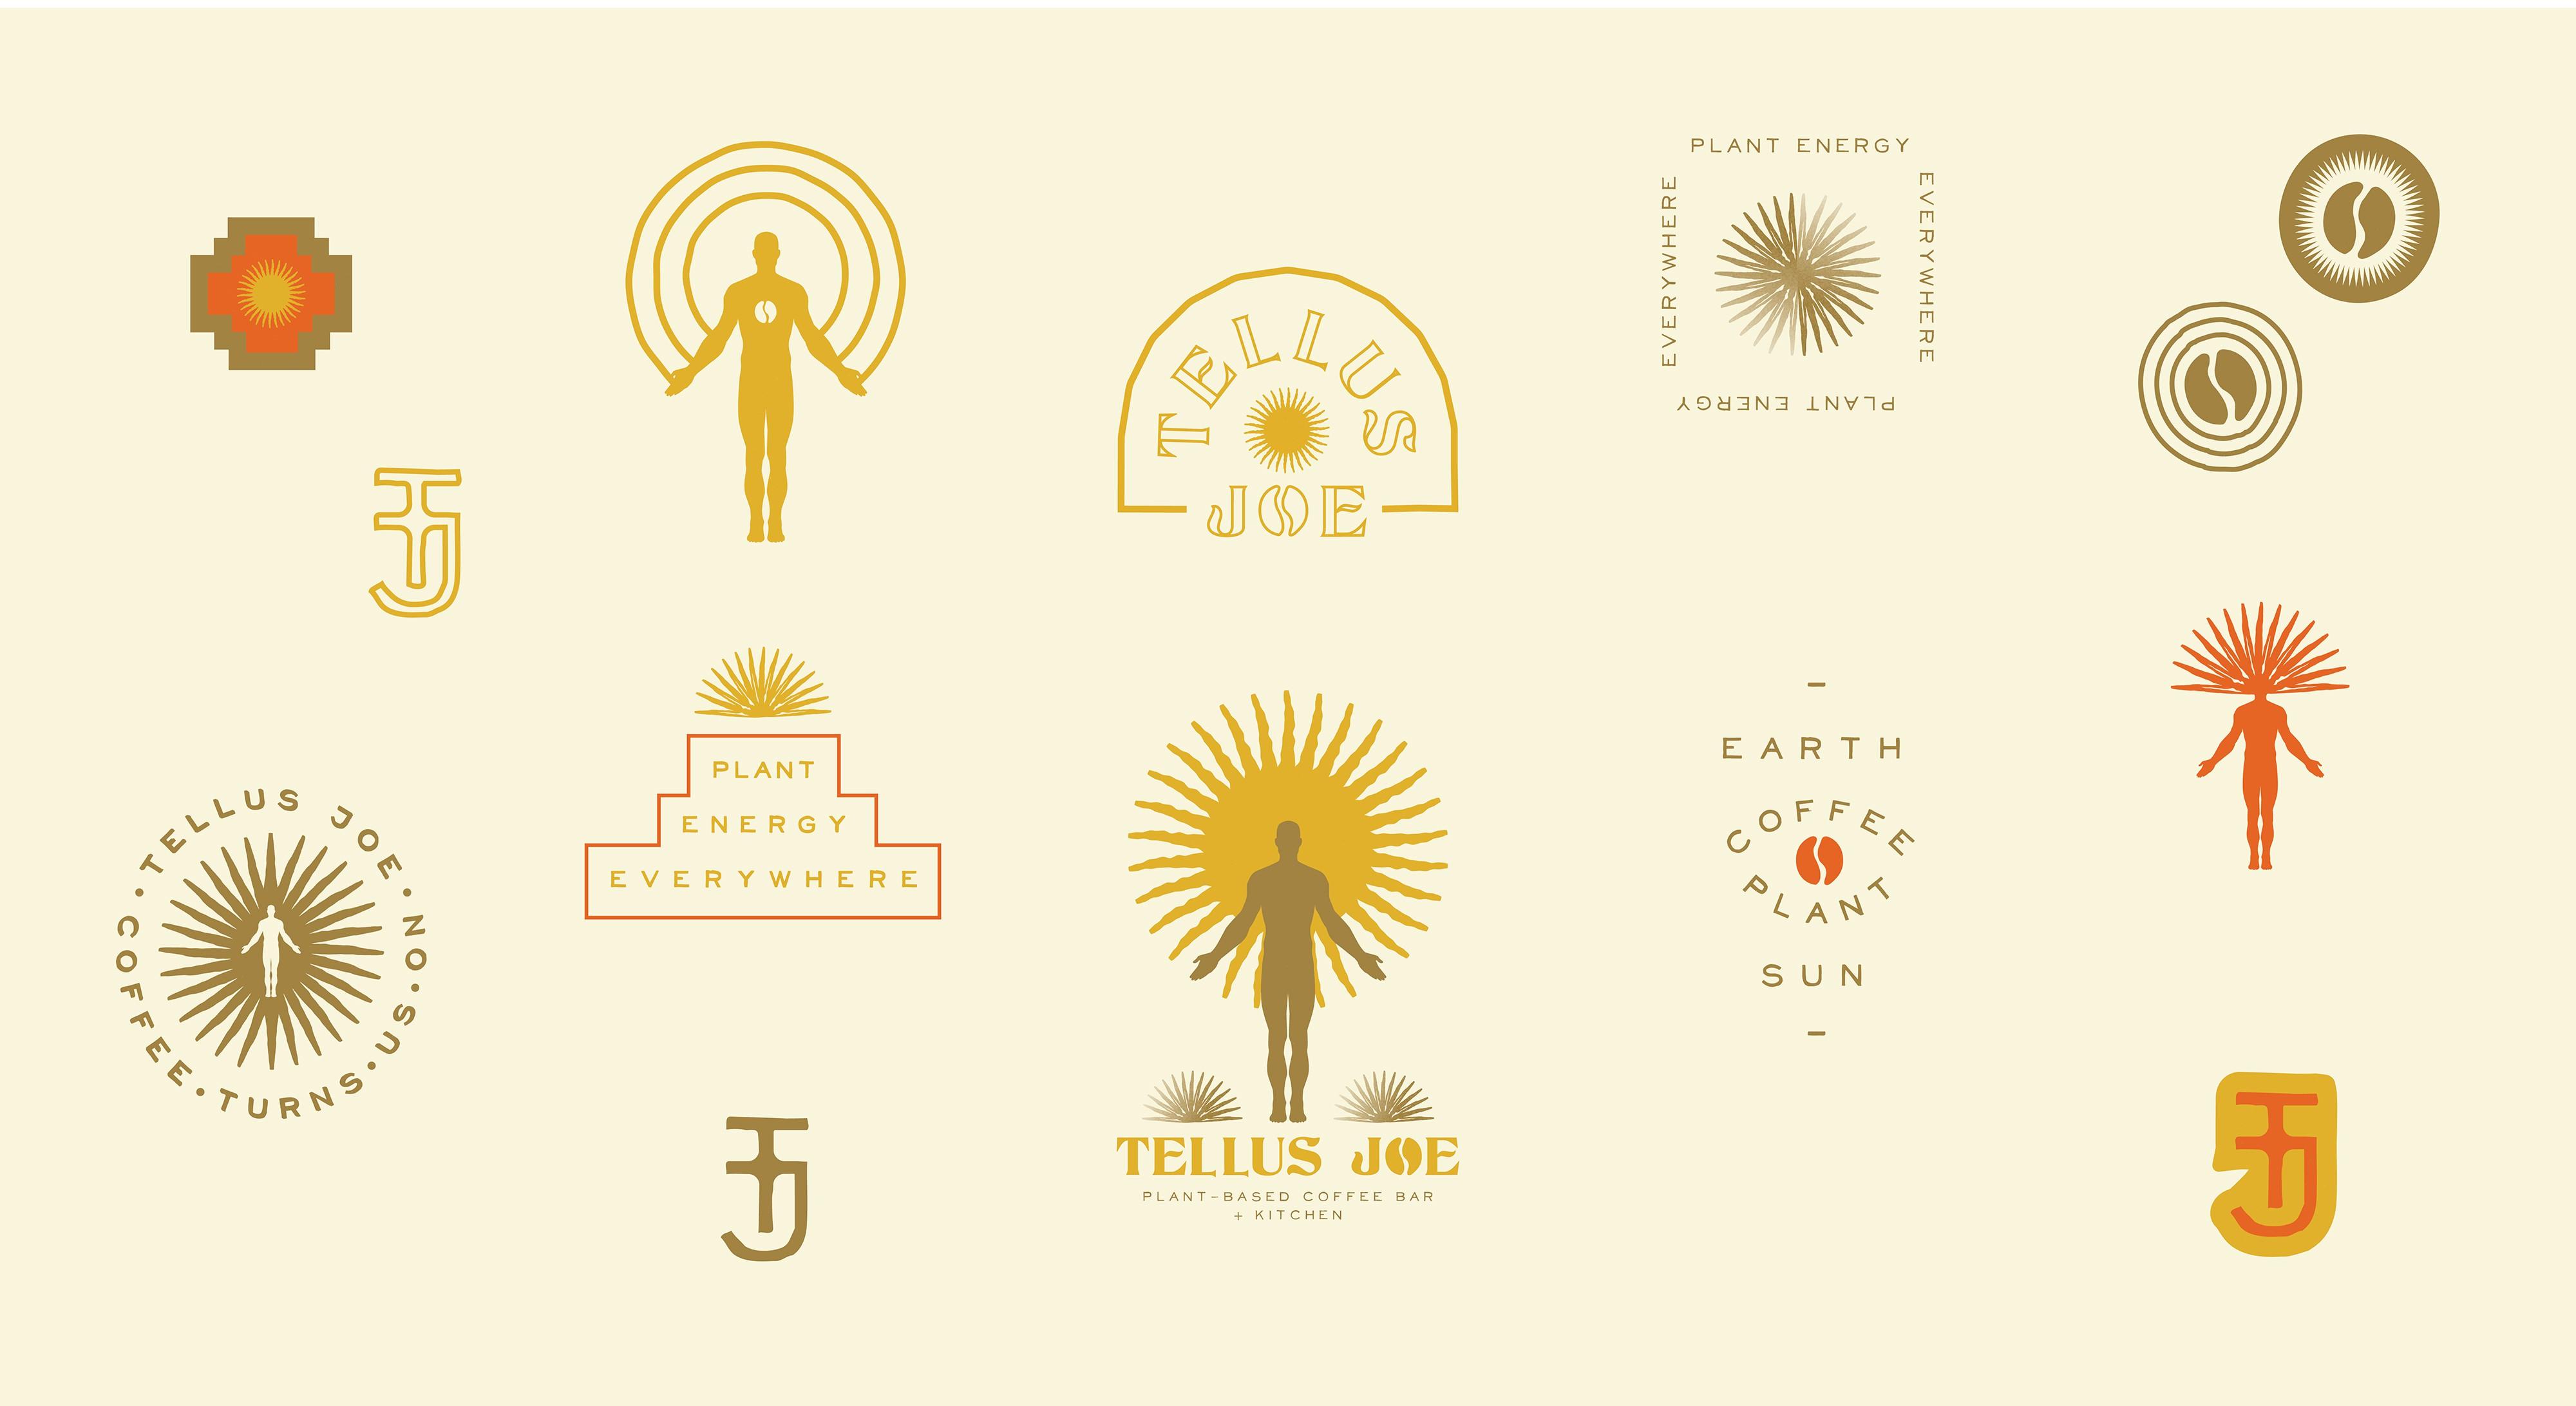 Tellus Joe Phase 2: Branding Icons